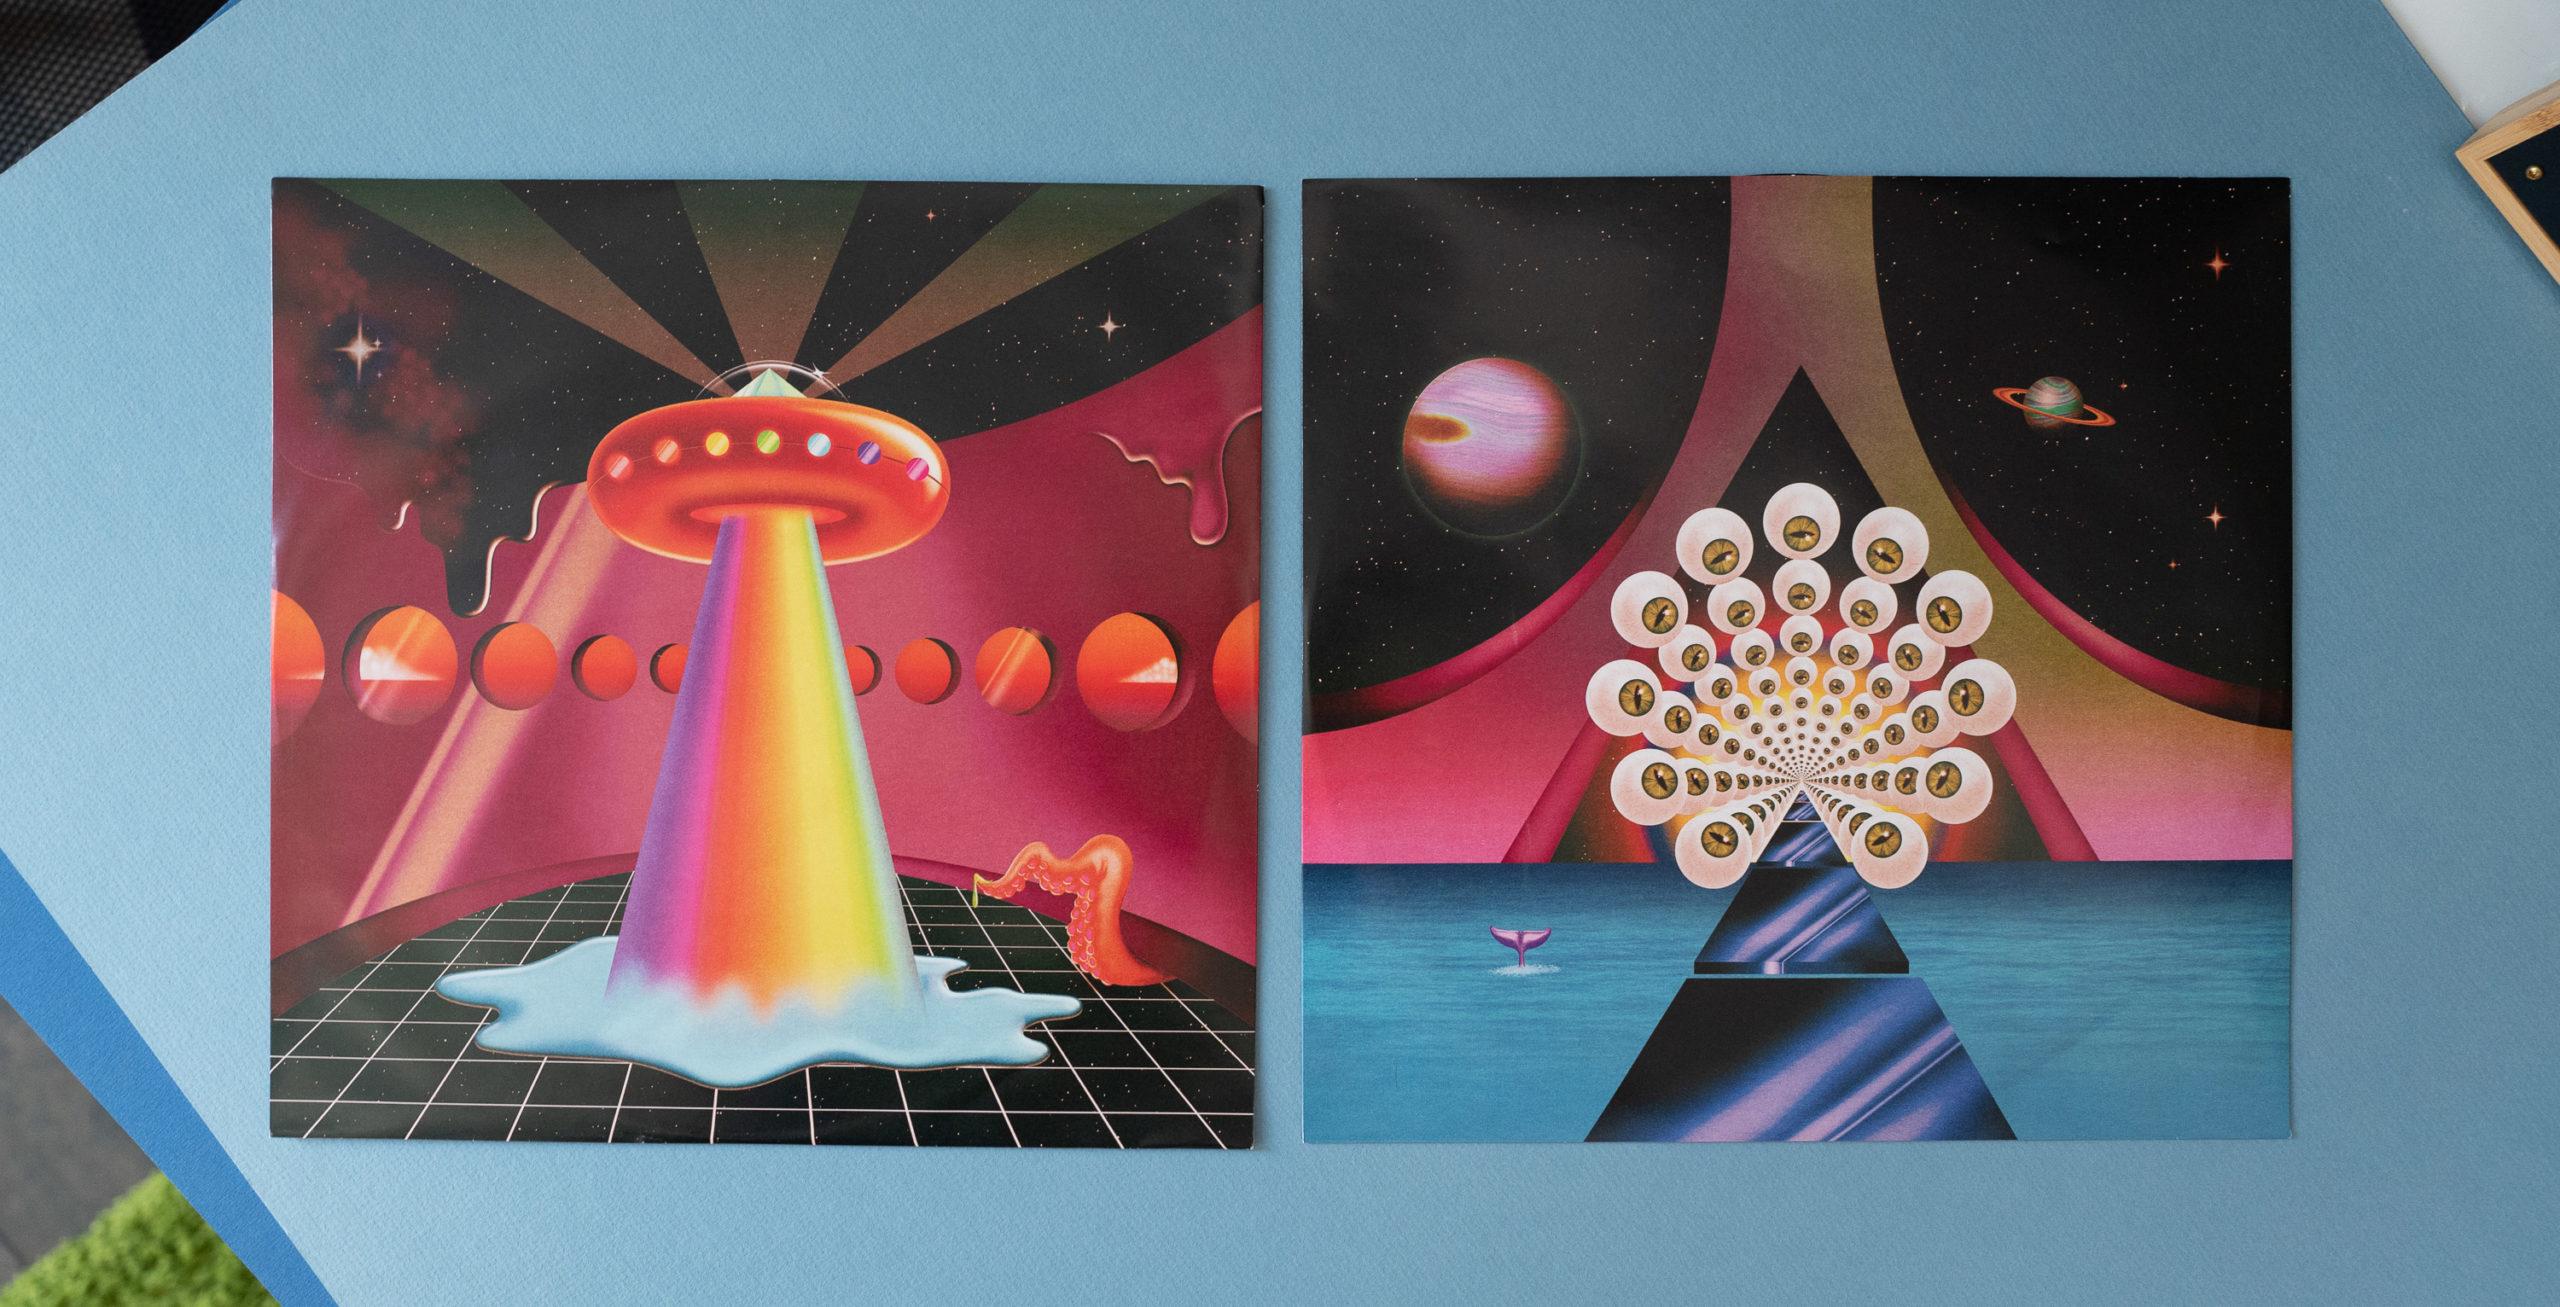 Interror designs for Kesha's Rainbow record